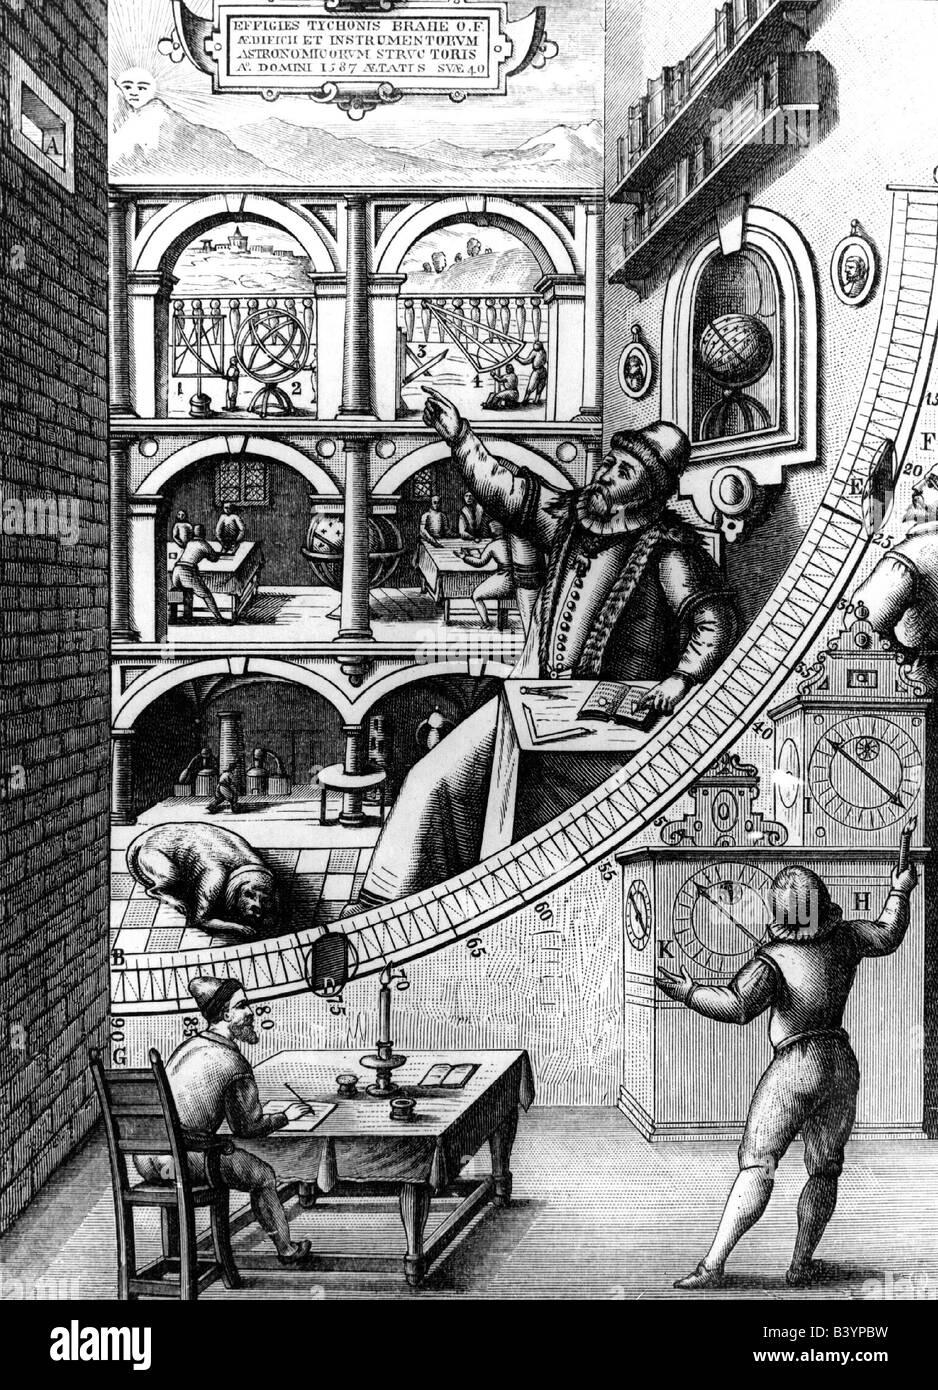 Brahe, Tycho, 14.12.1546 - 24.10.1601, Danish astronomer,   nobleman, Tyge, astronomy, Quadrans Muralis, observatory - Stock Image